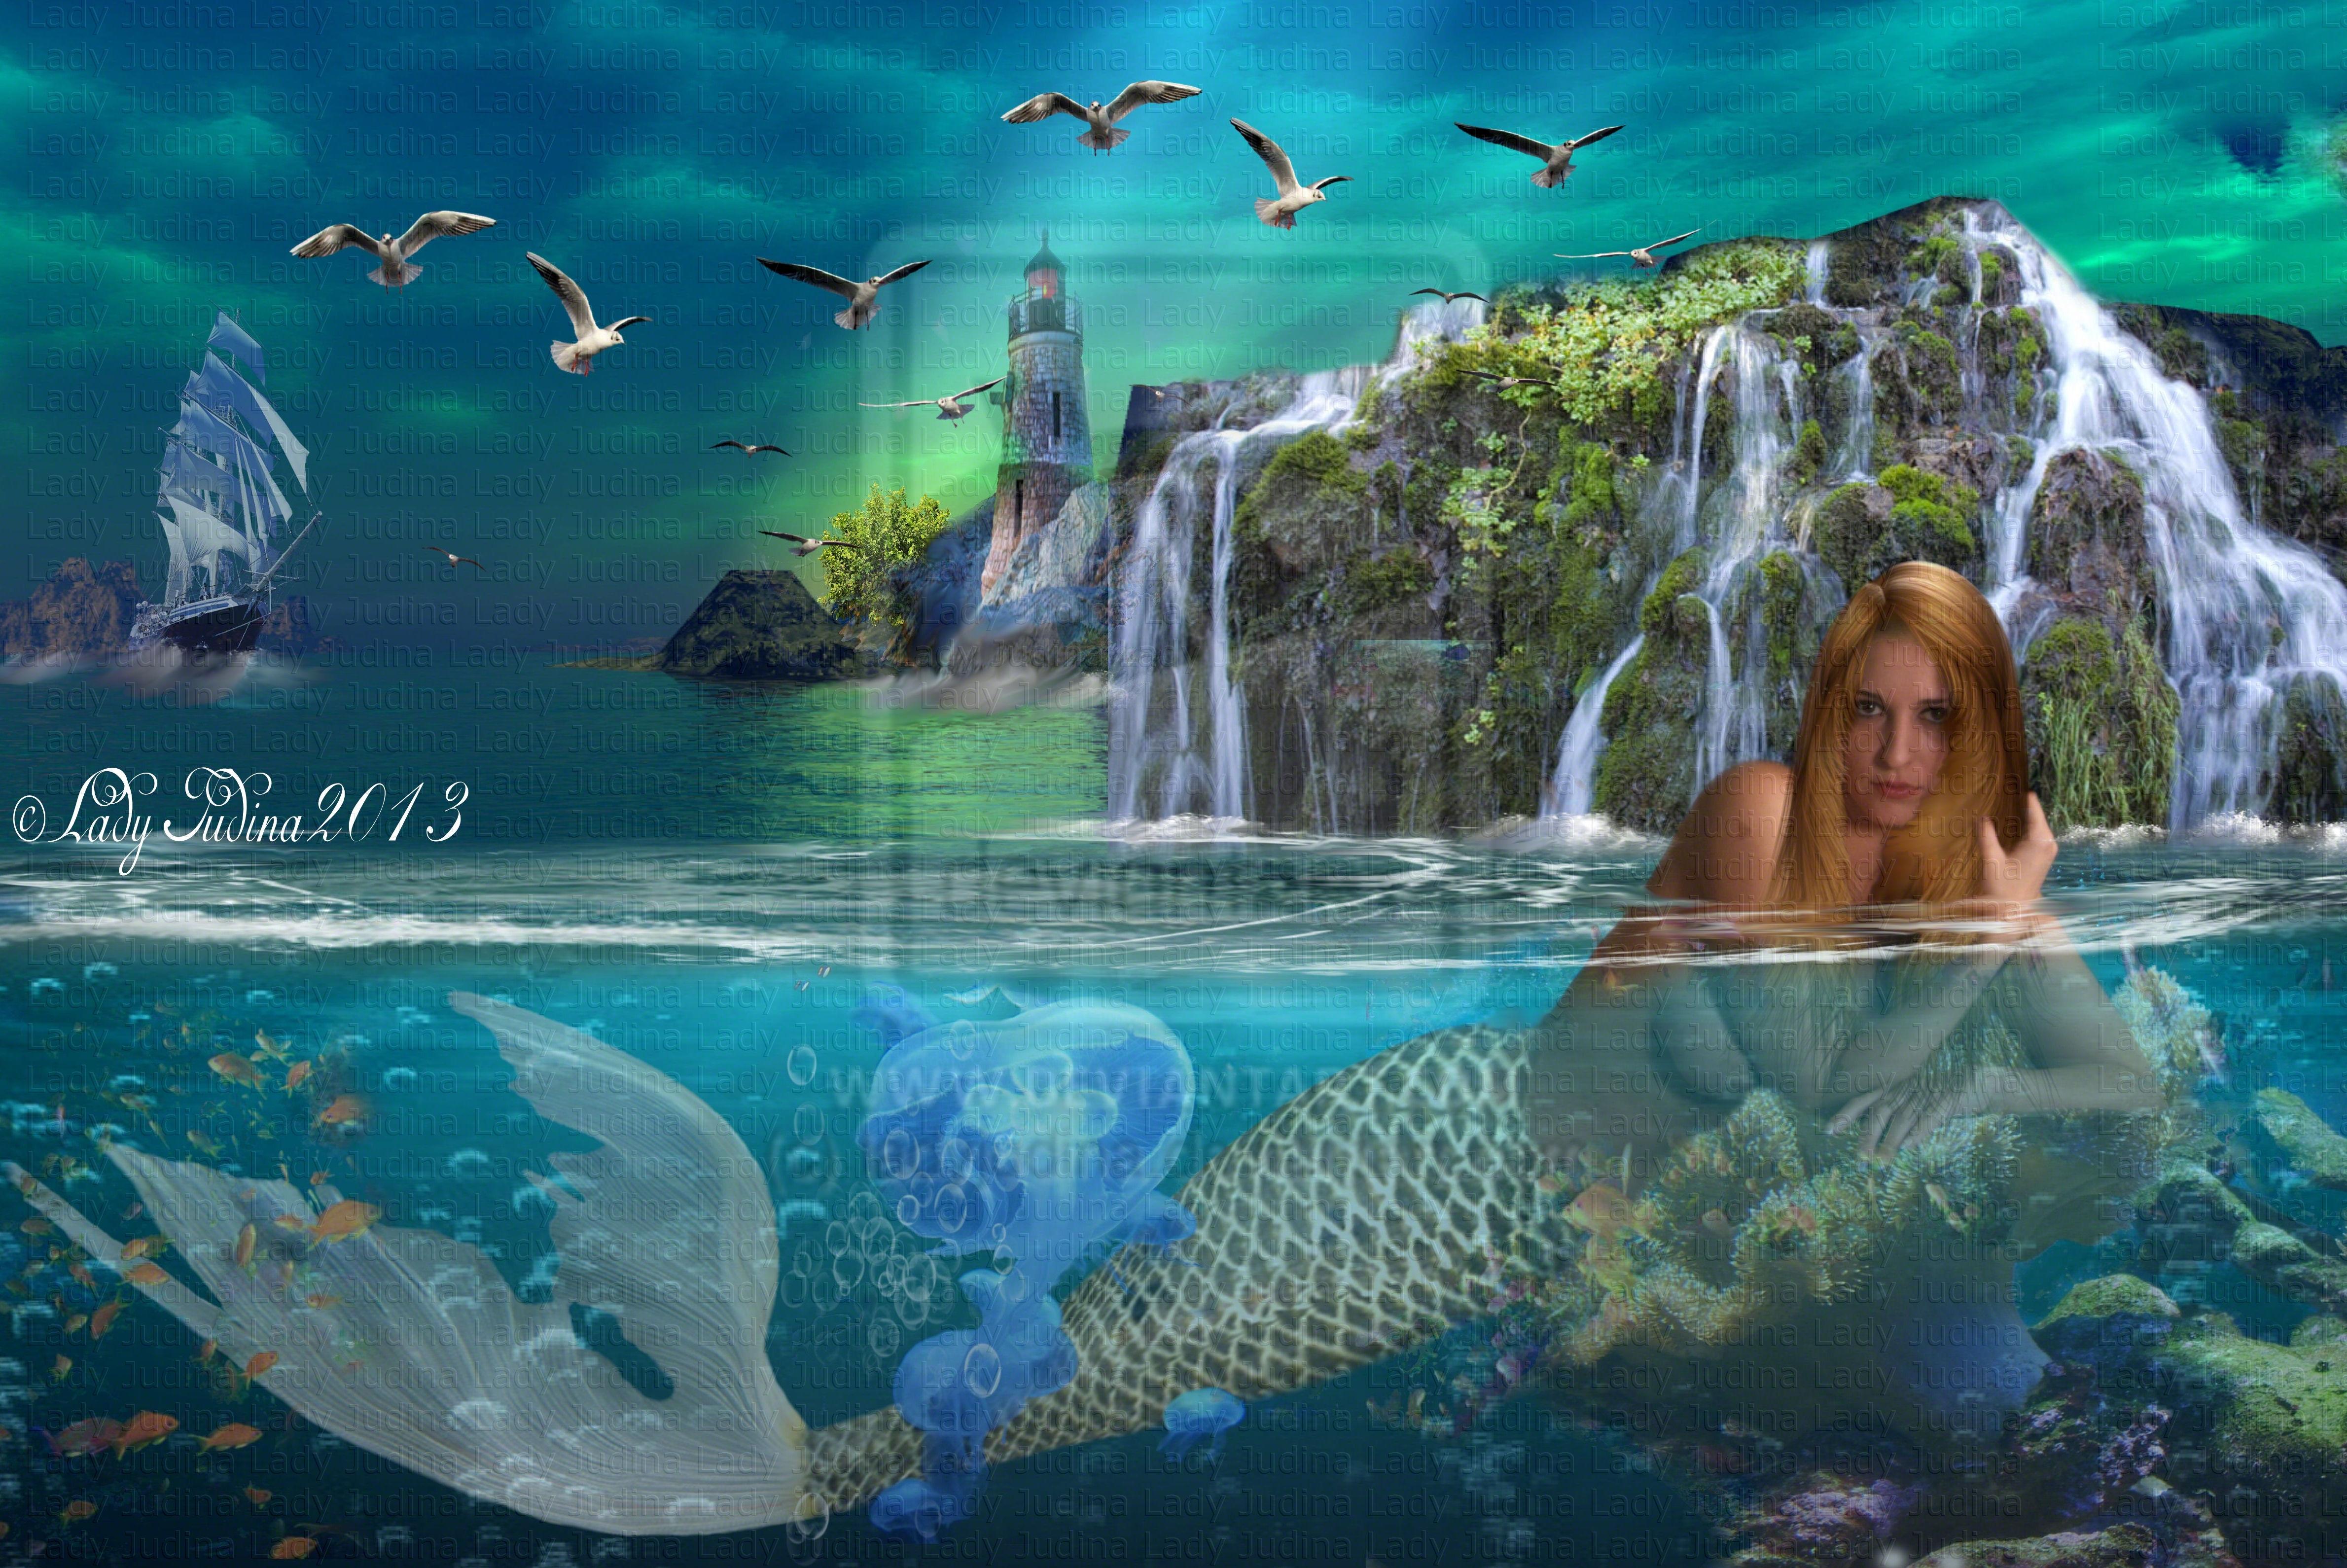 Mermaid Bay 4 - Mermaid obol 4 by ladyjudina